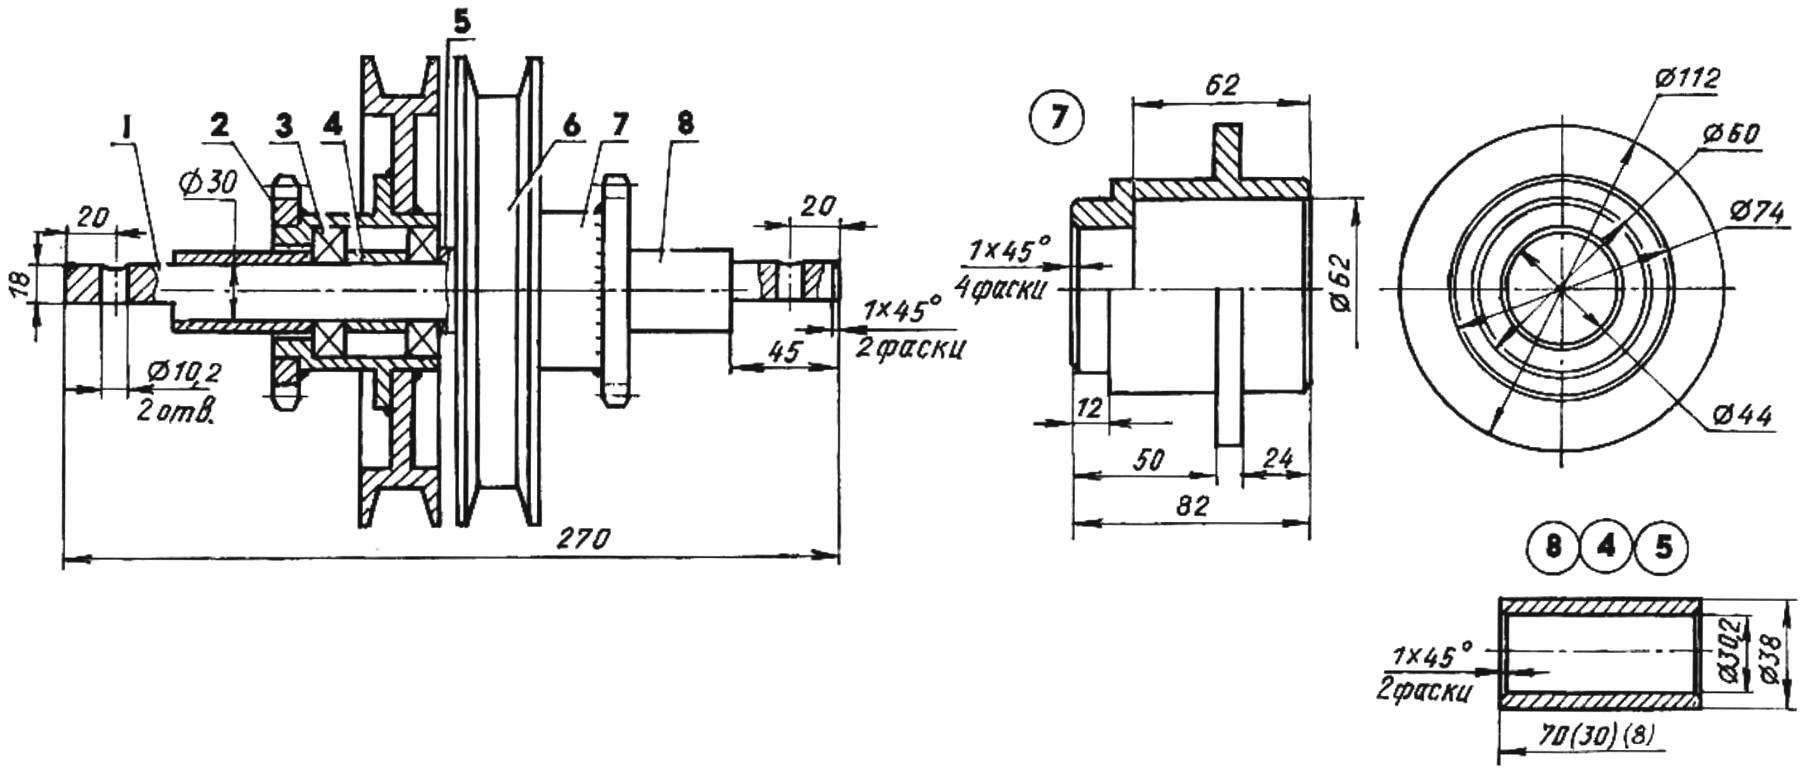 Node idomou shaft of the variator